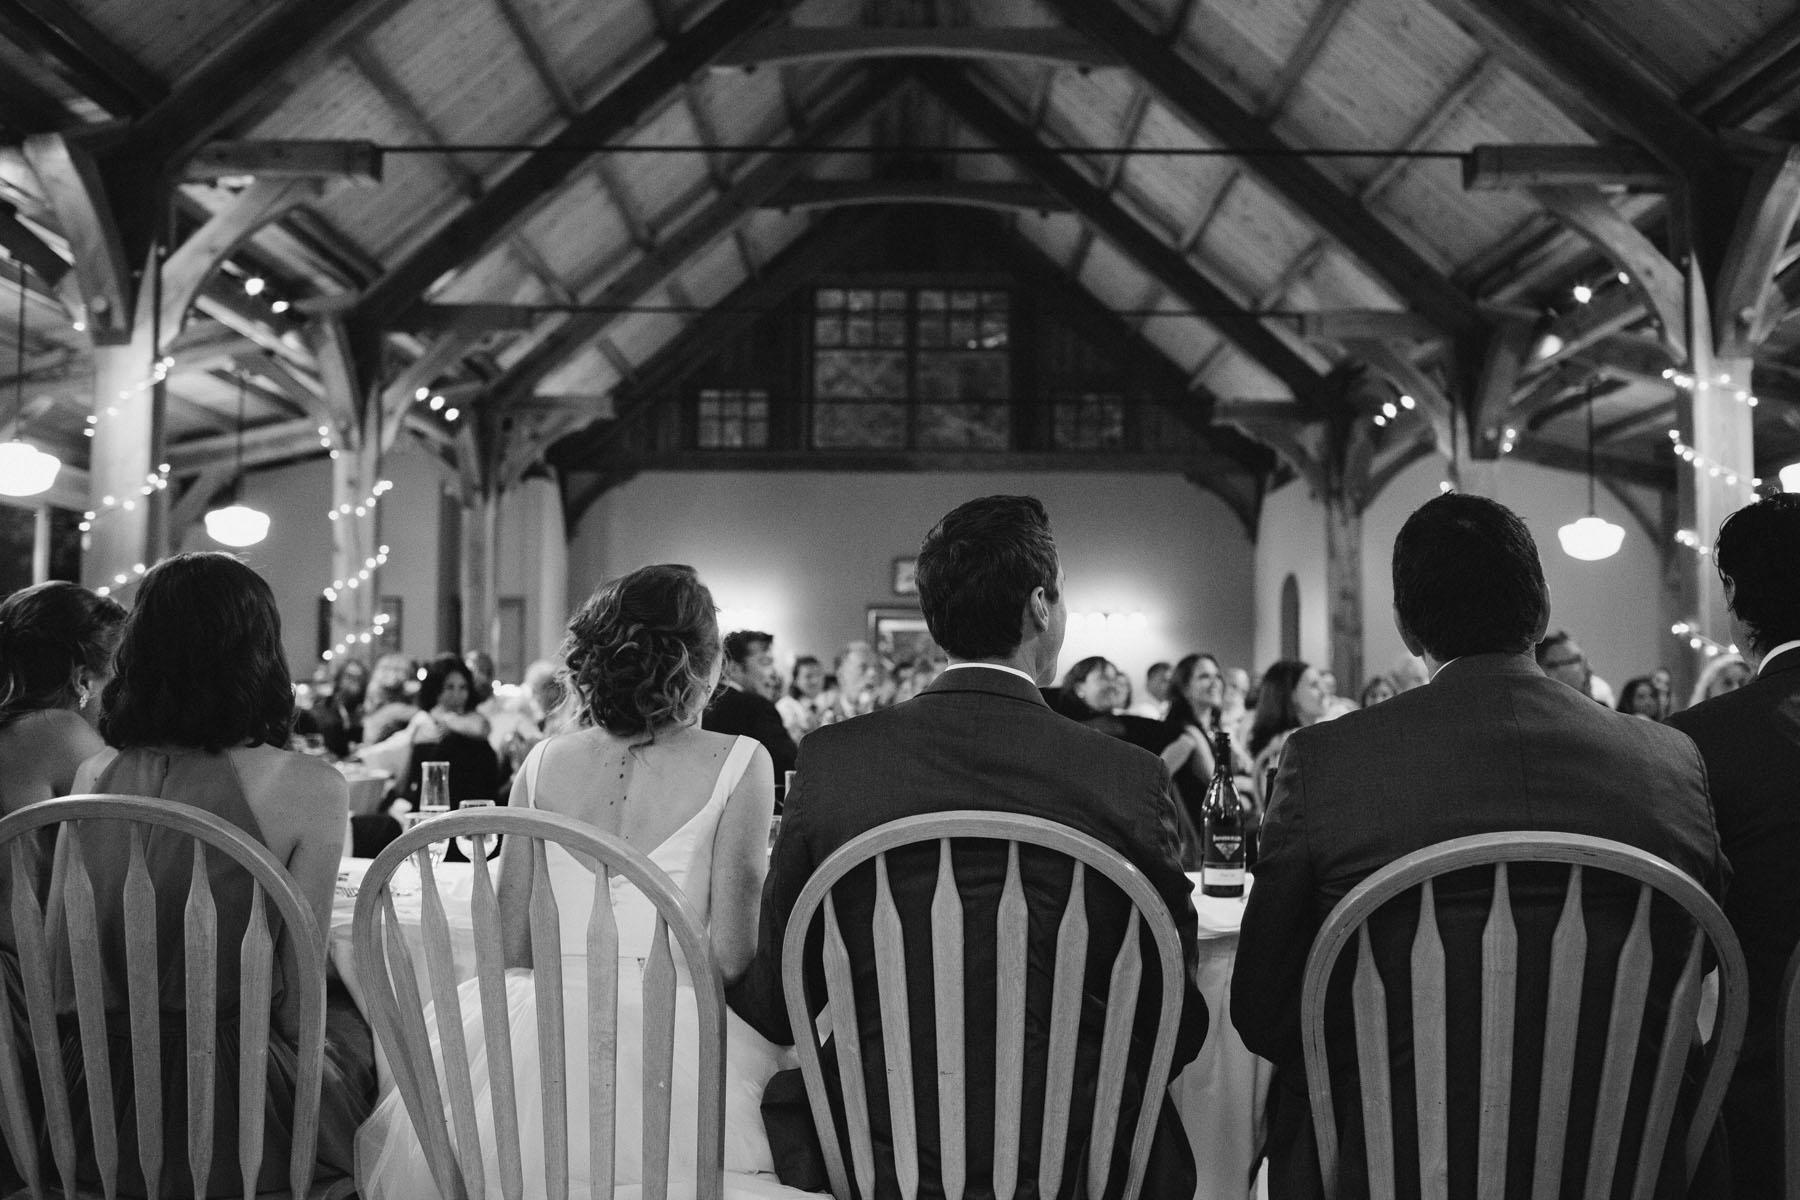 thetis-island-wedding-photographer-rp-rn-168.jpg